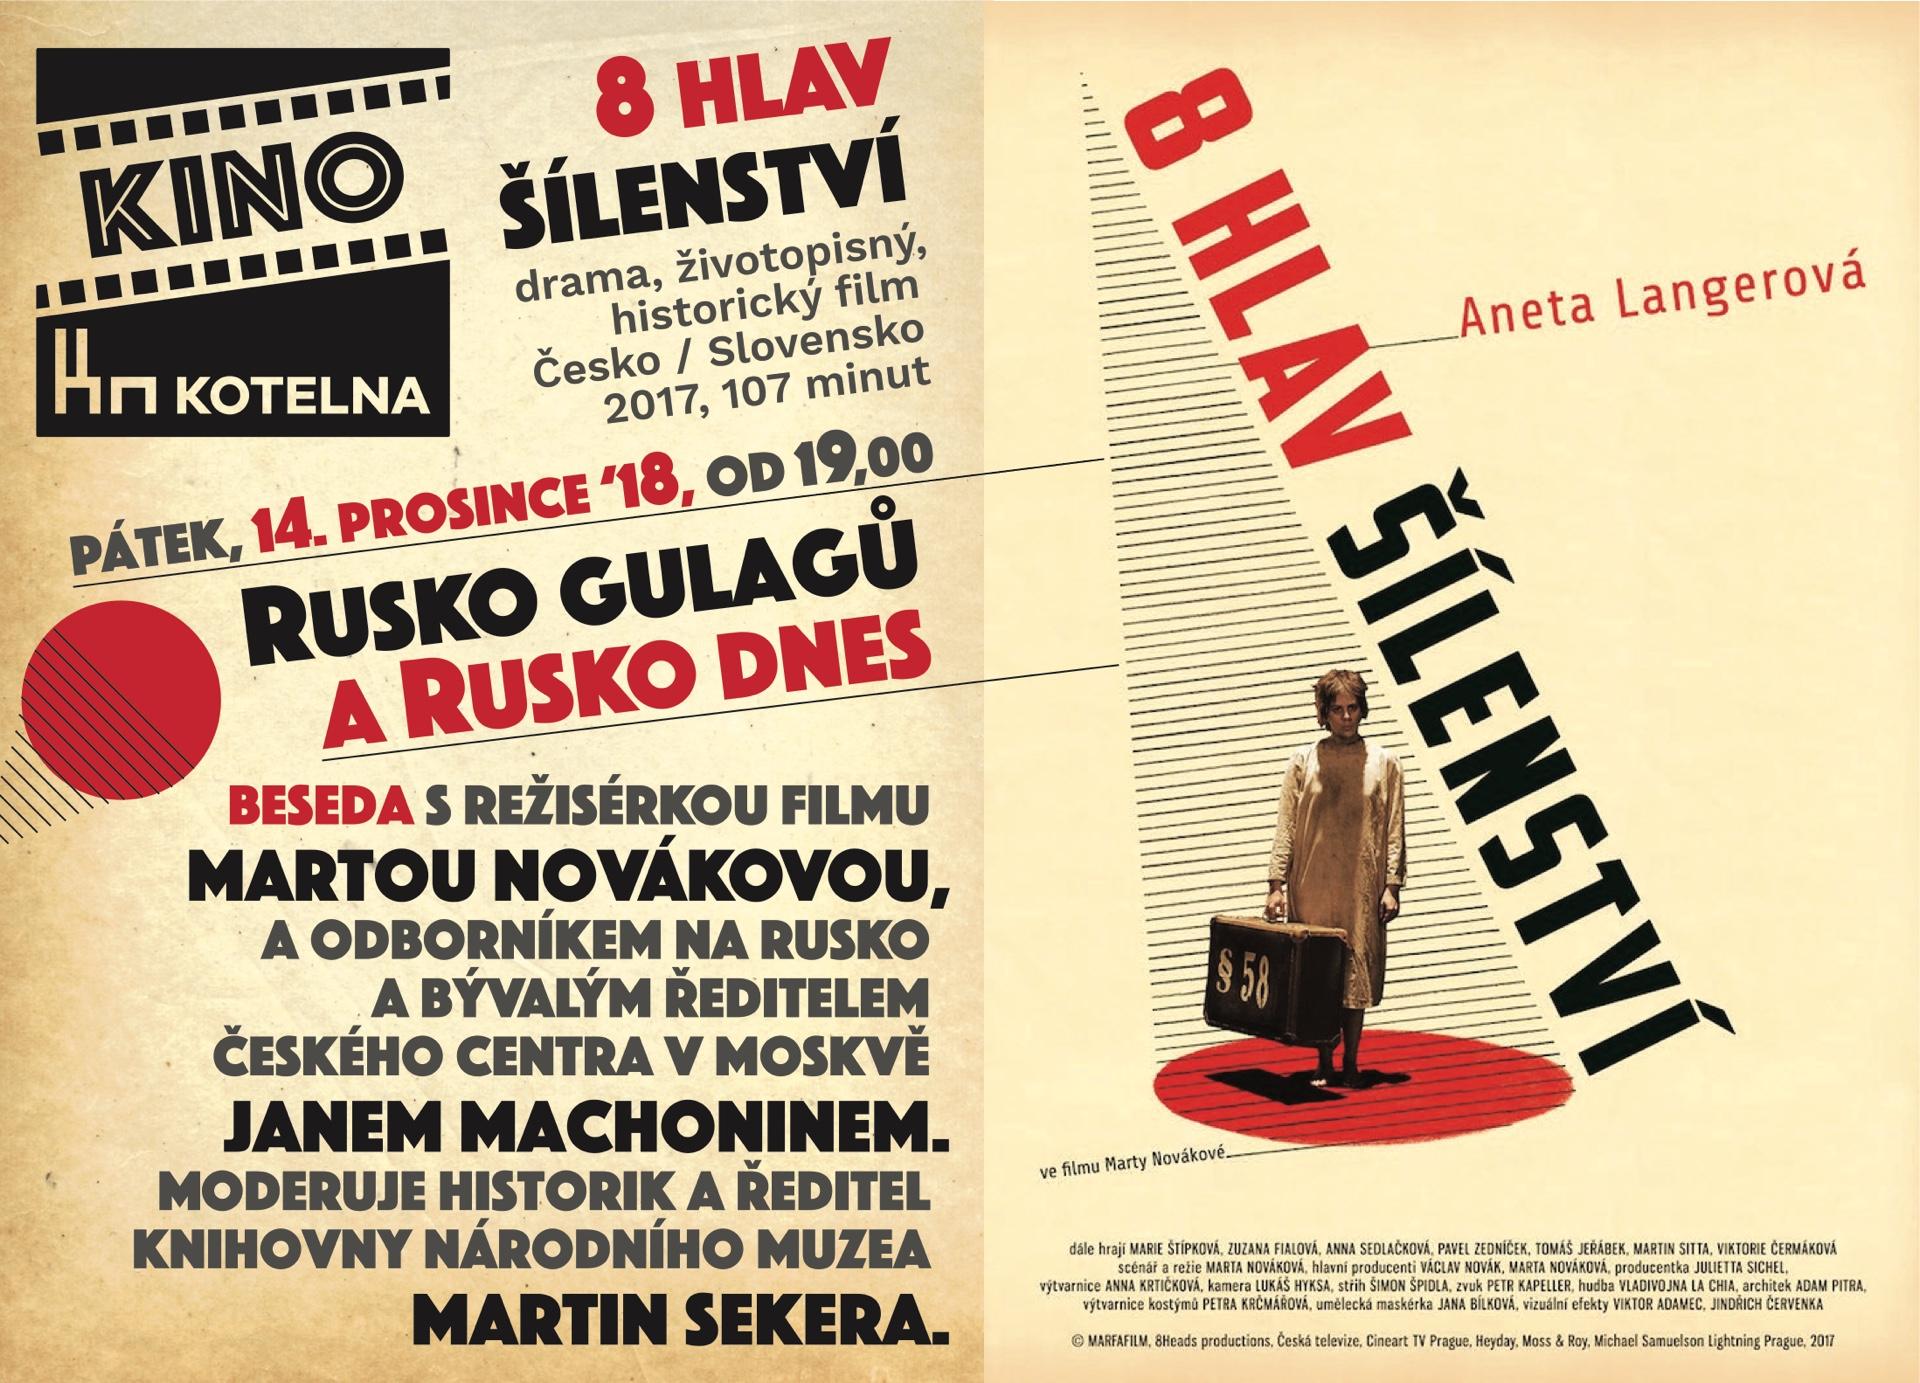 Kino Kotelna - 8 hlav s besedou